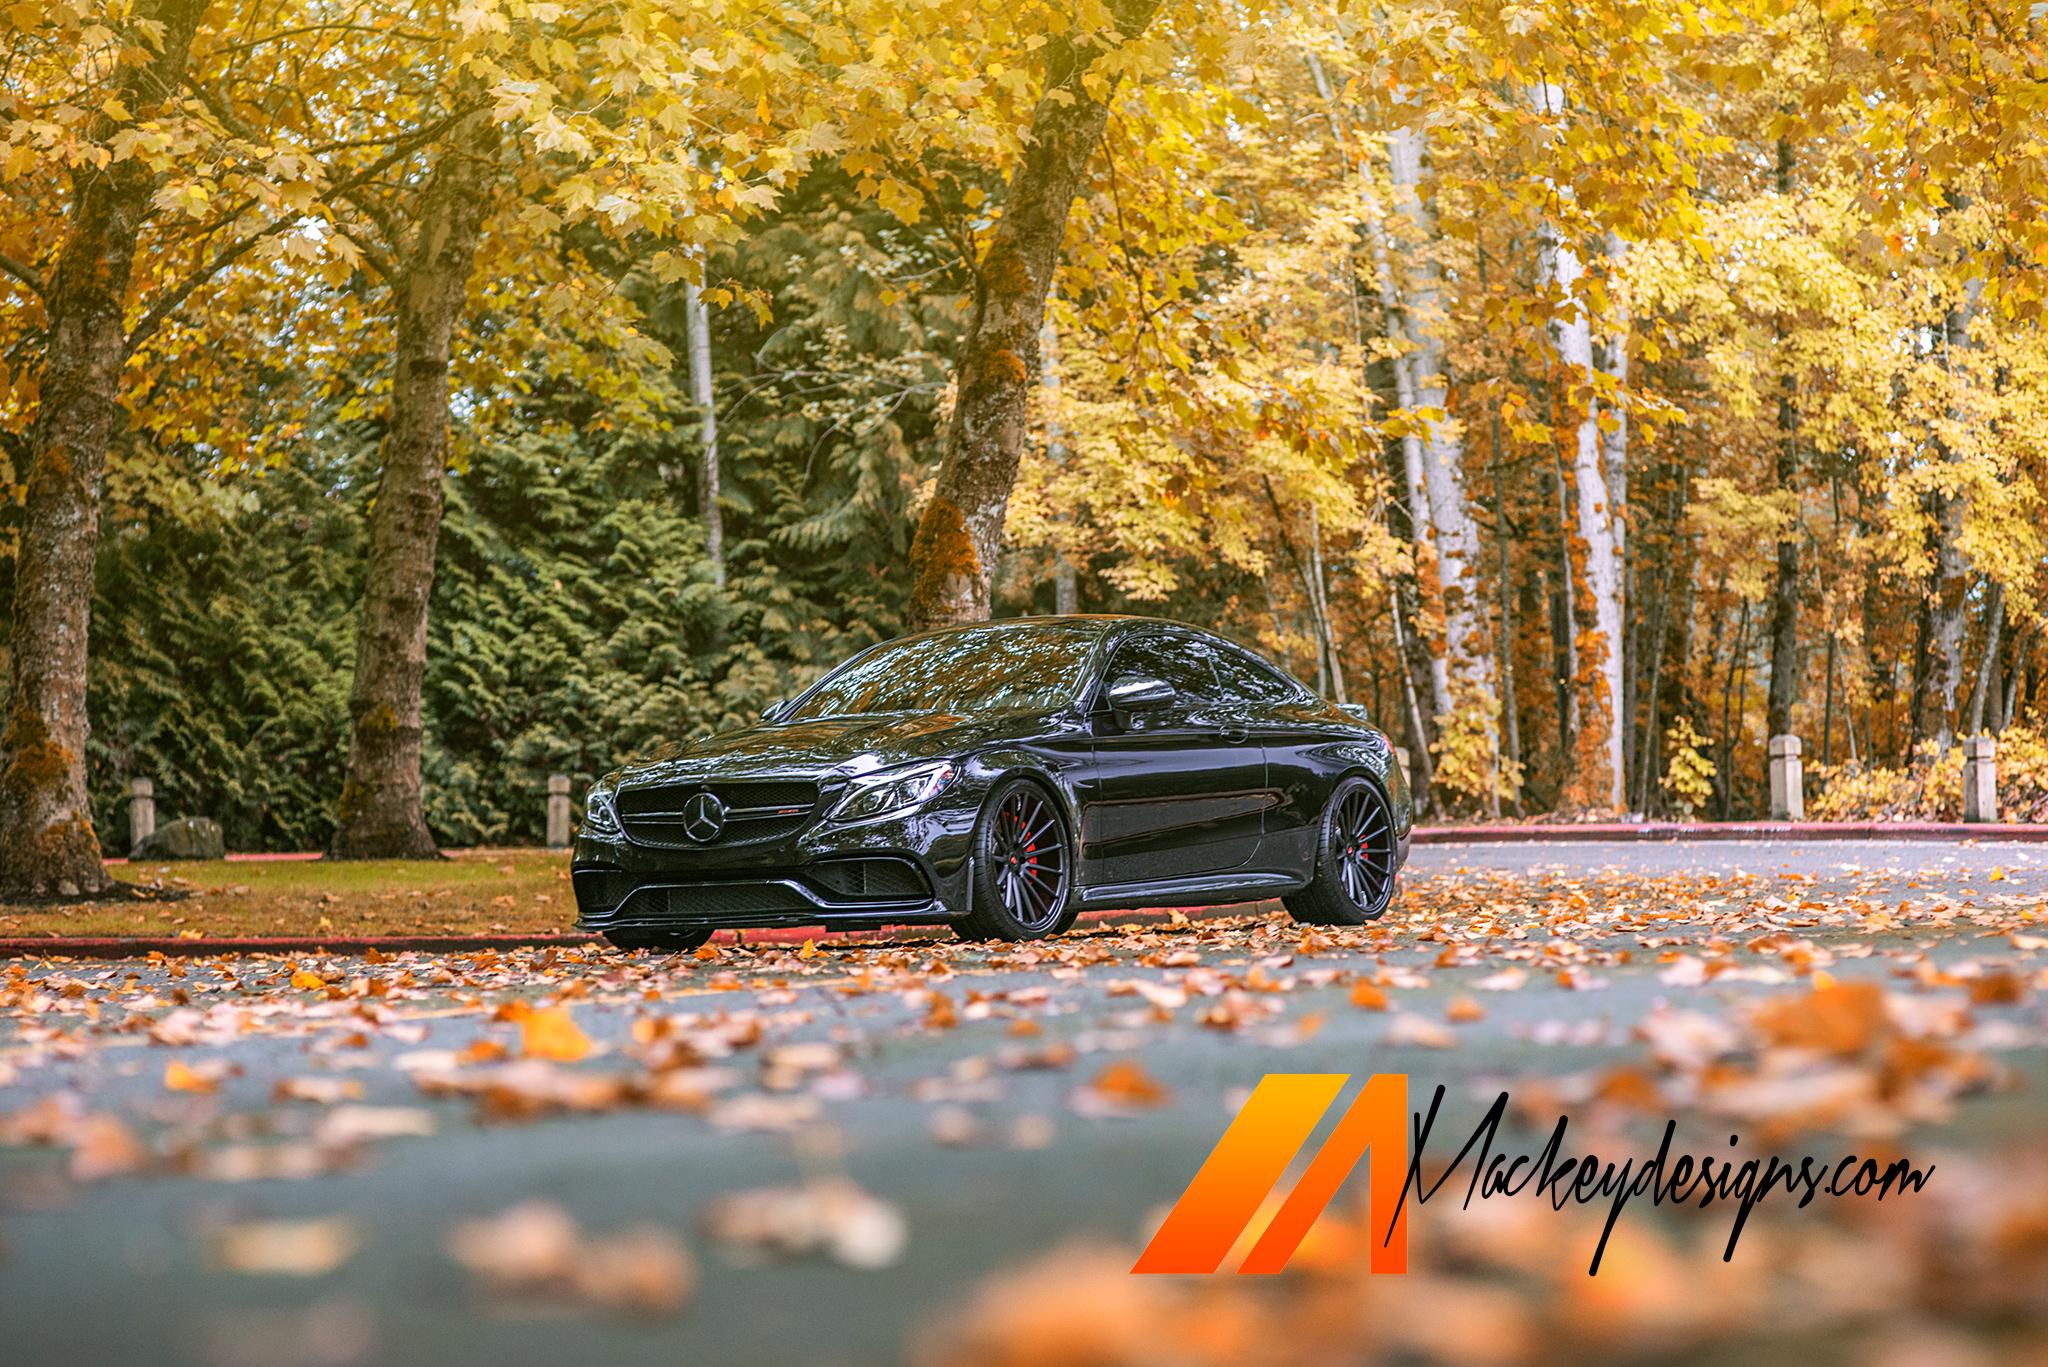 Mackeydesigns_Mercedes_C63S-1.jpg